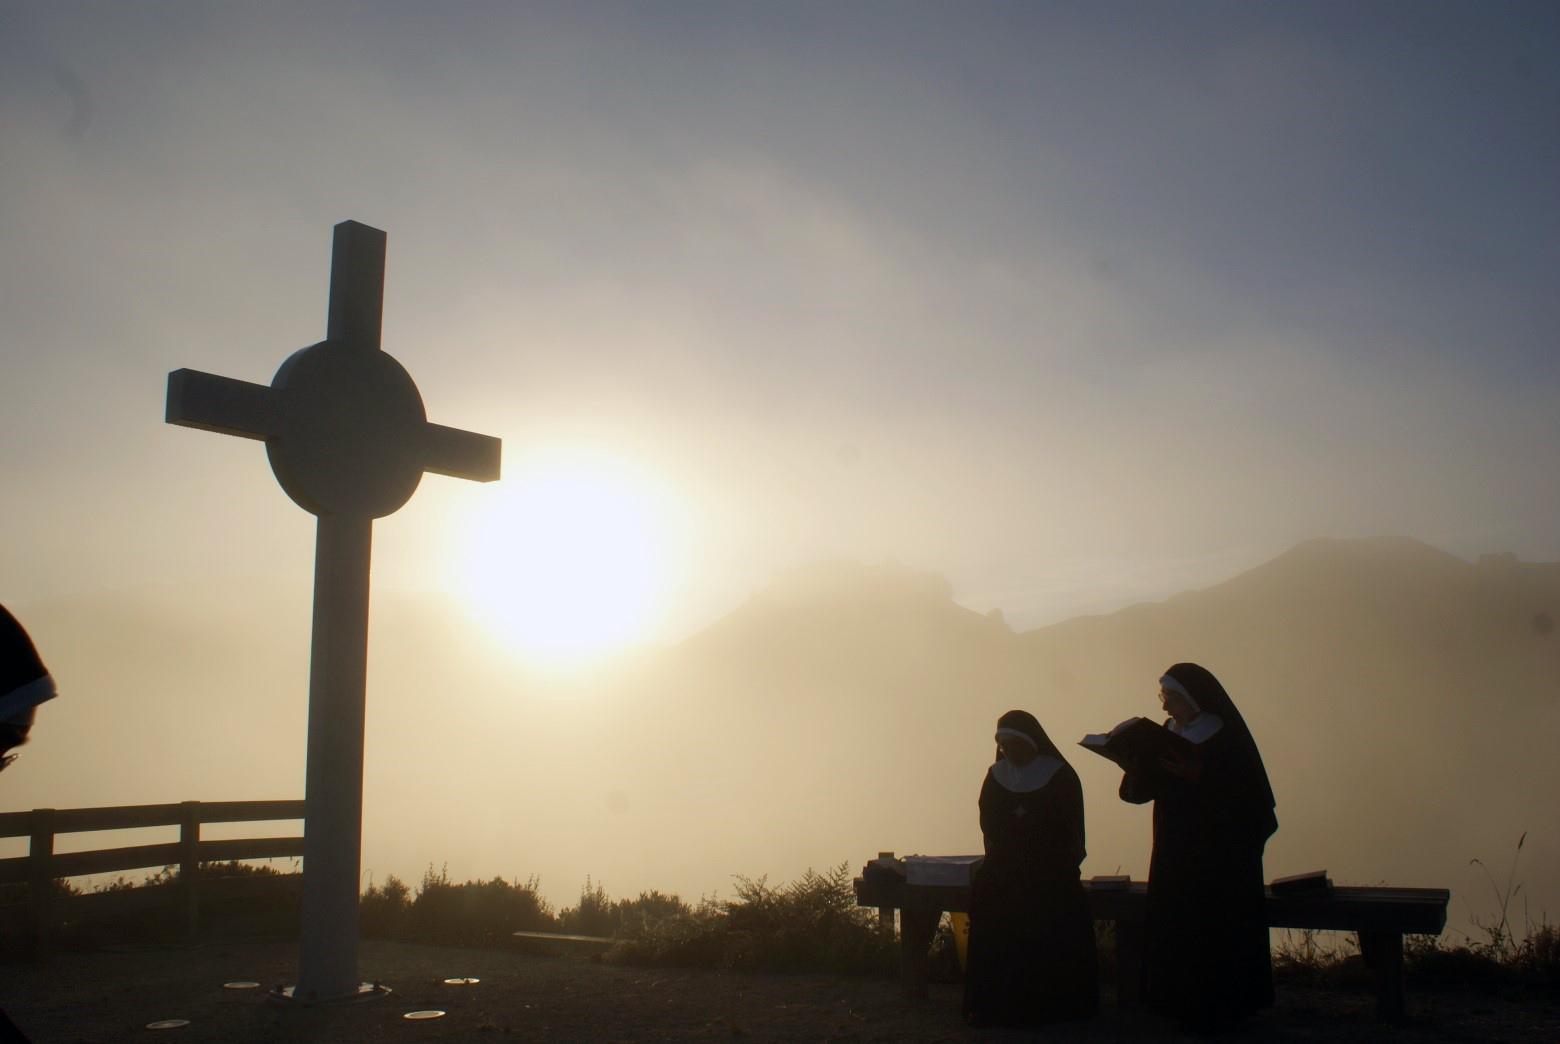 Praising God at dawn